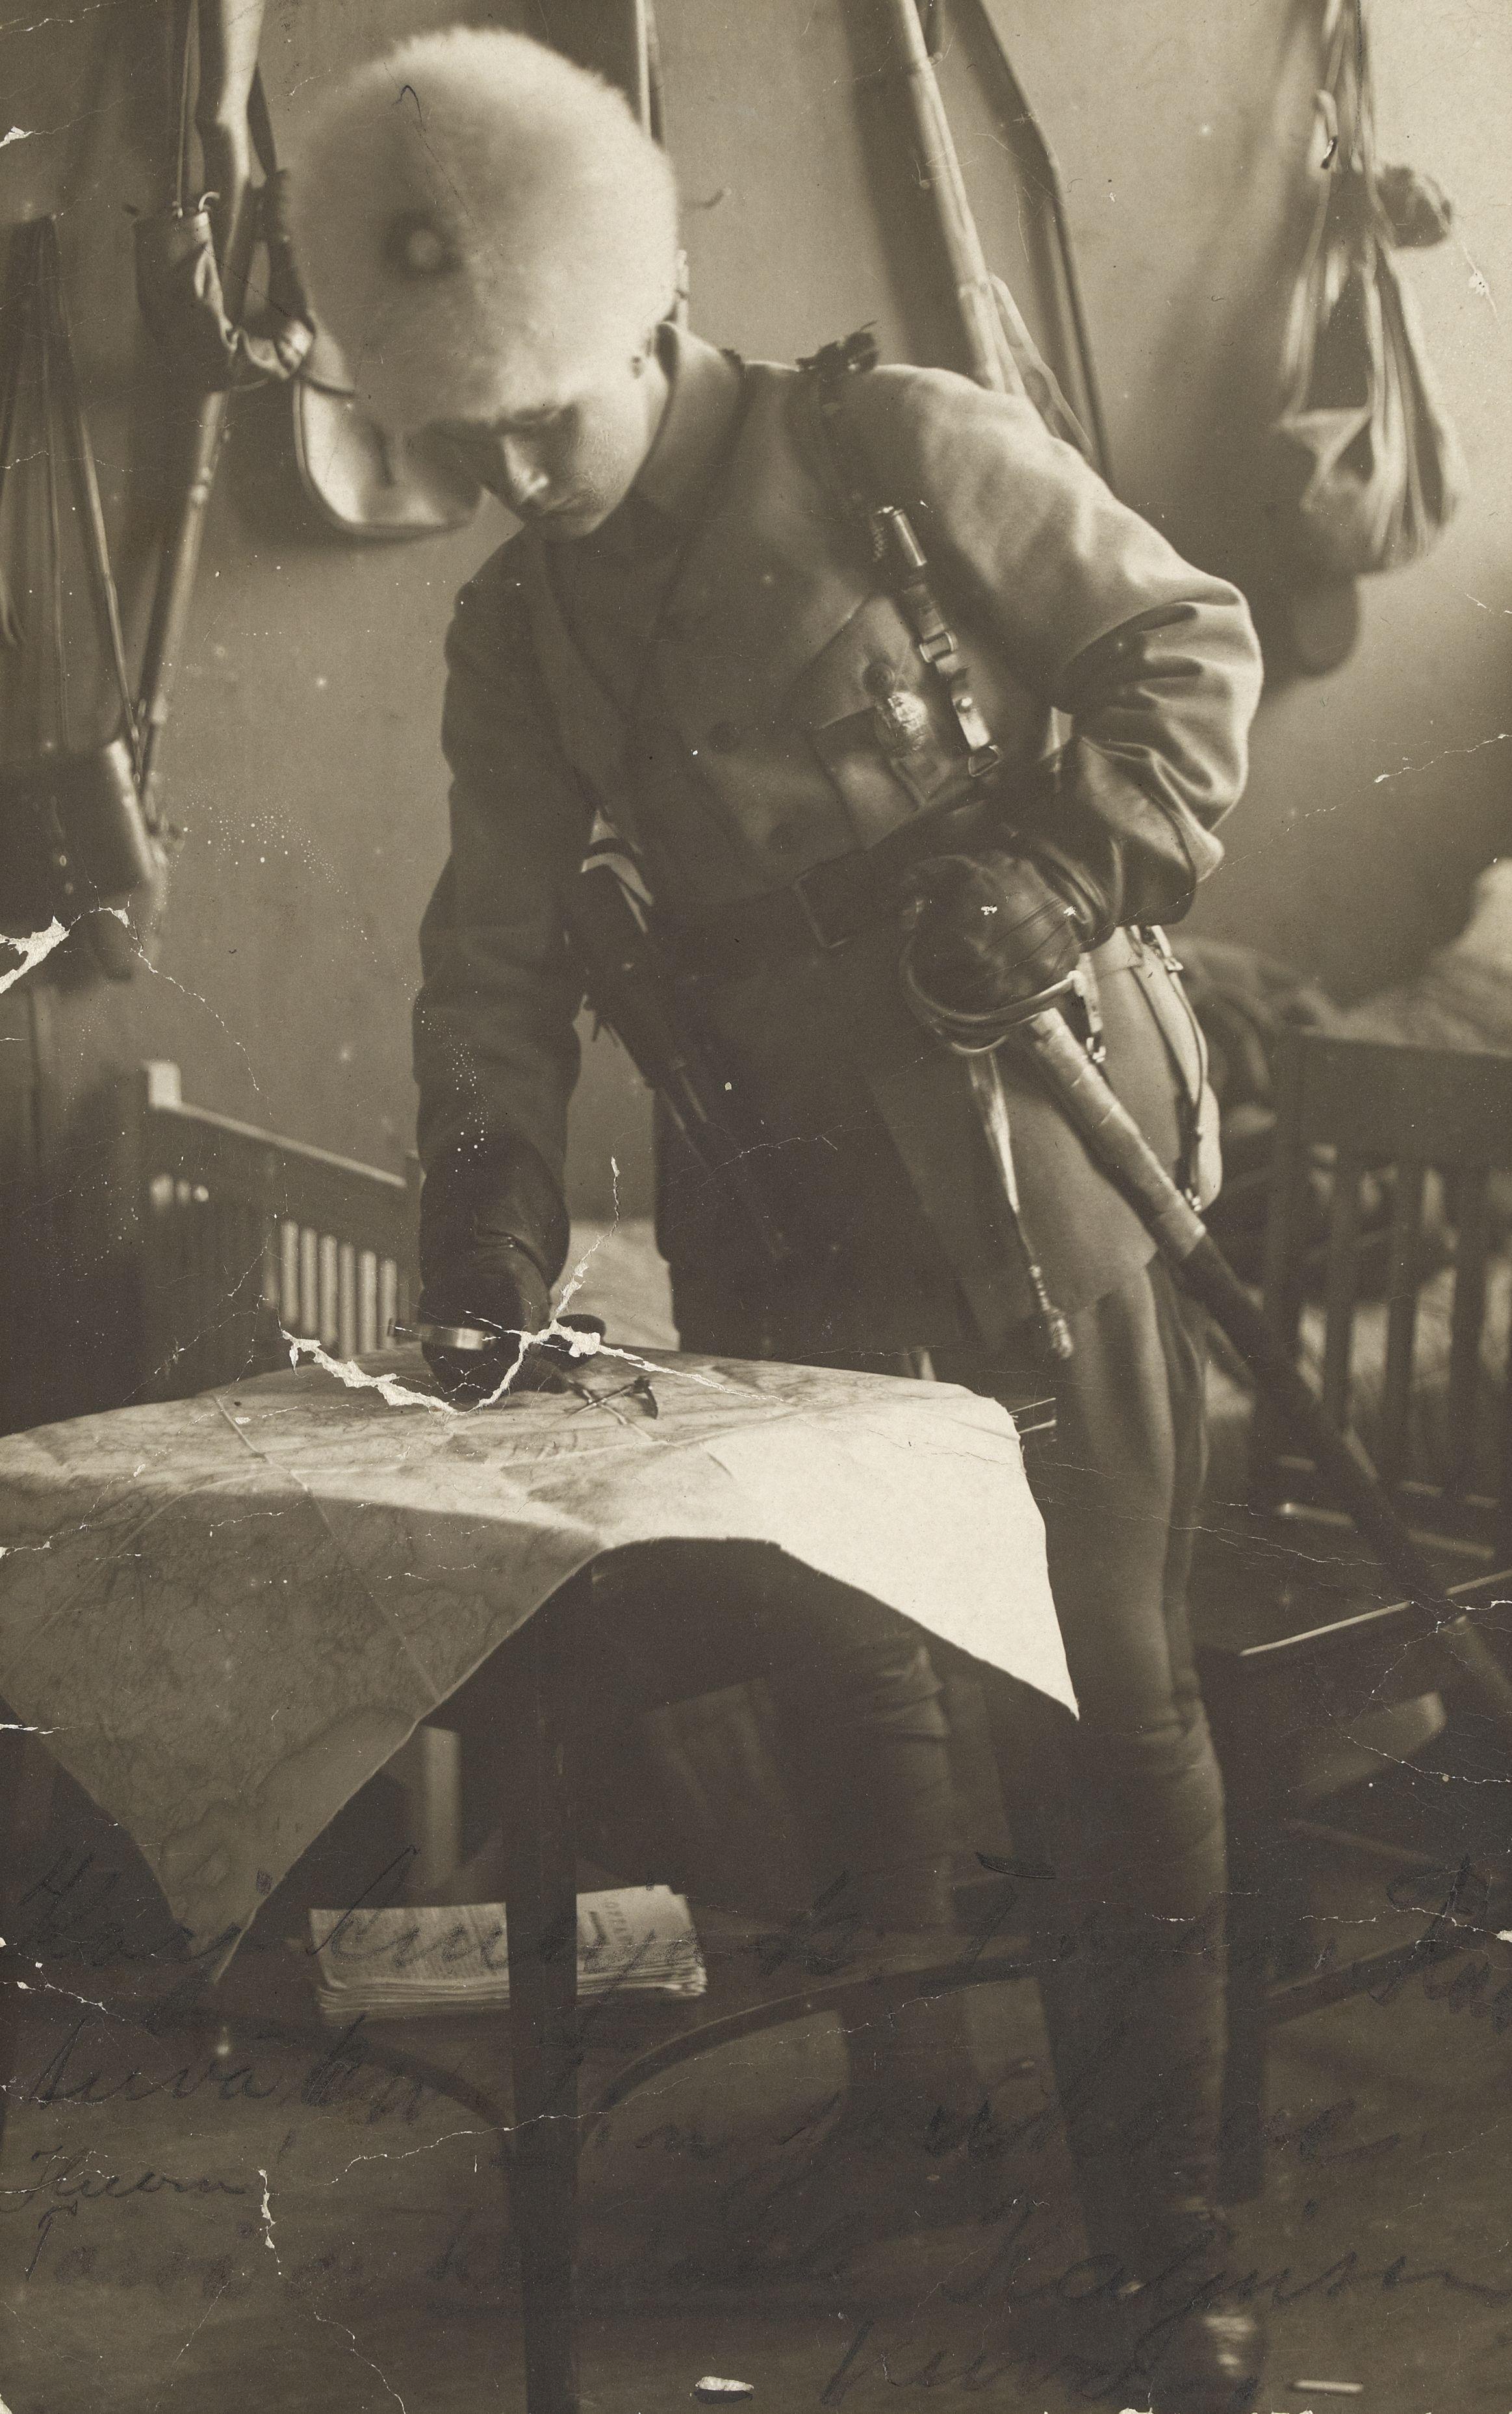 Heikki Kaljunen